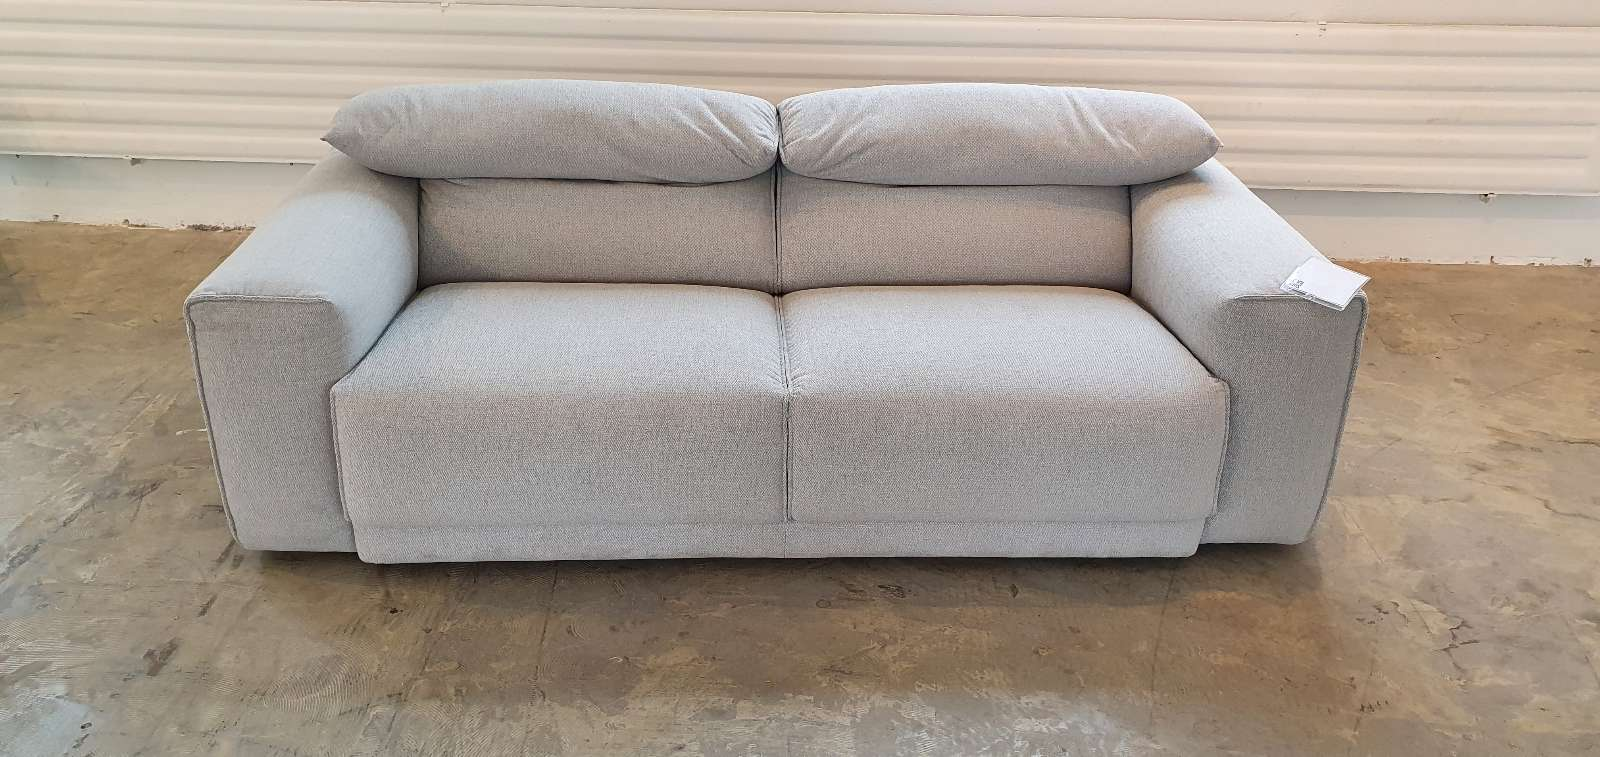 Sofa Loft – Designschöner 2-Sitzer light grey